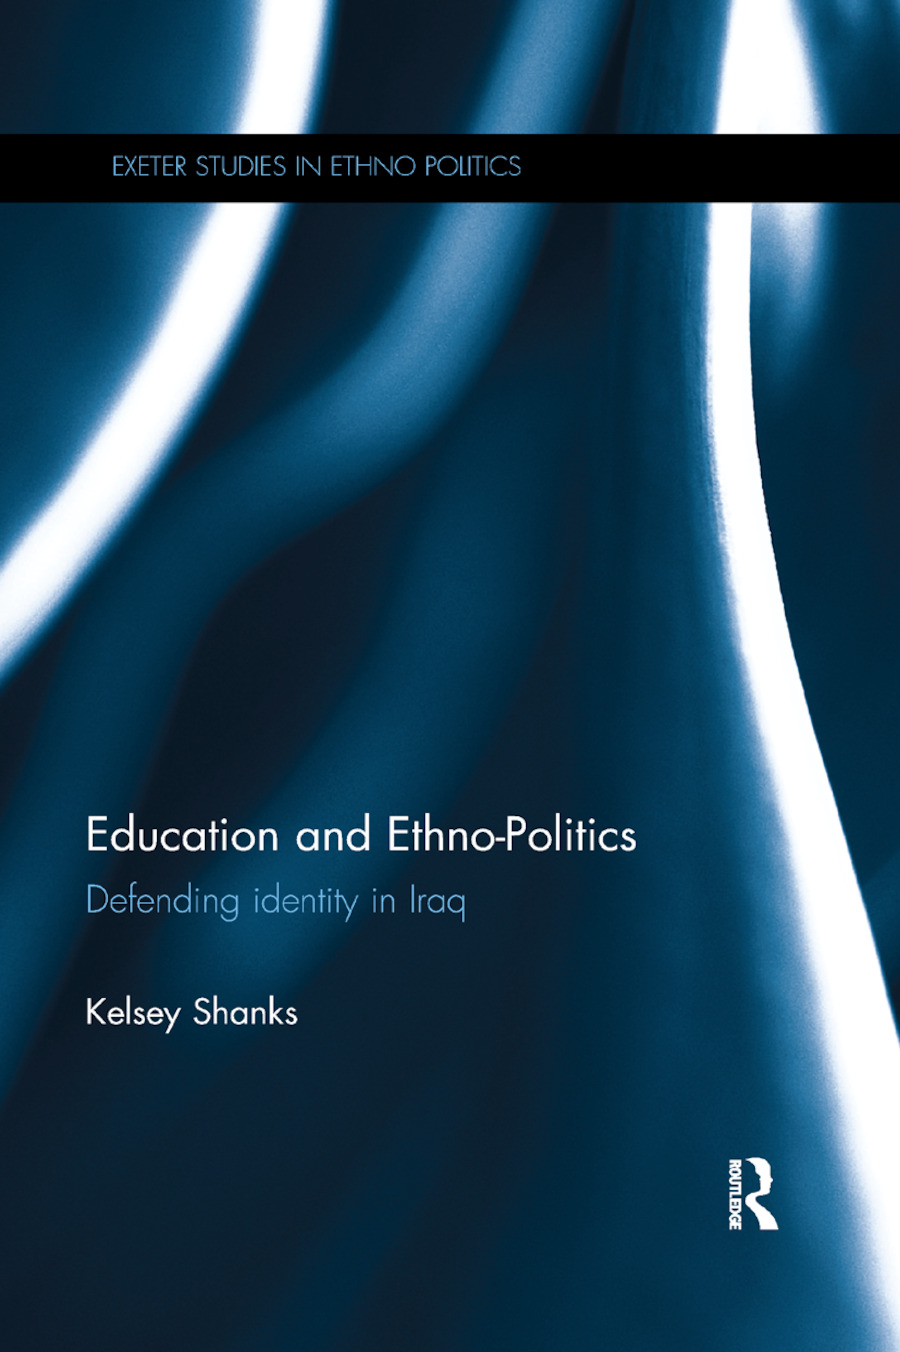 Education and Ethno-Politics: Defending Identity in Iraq book cover